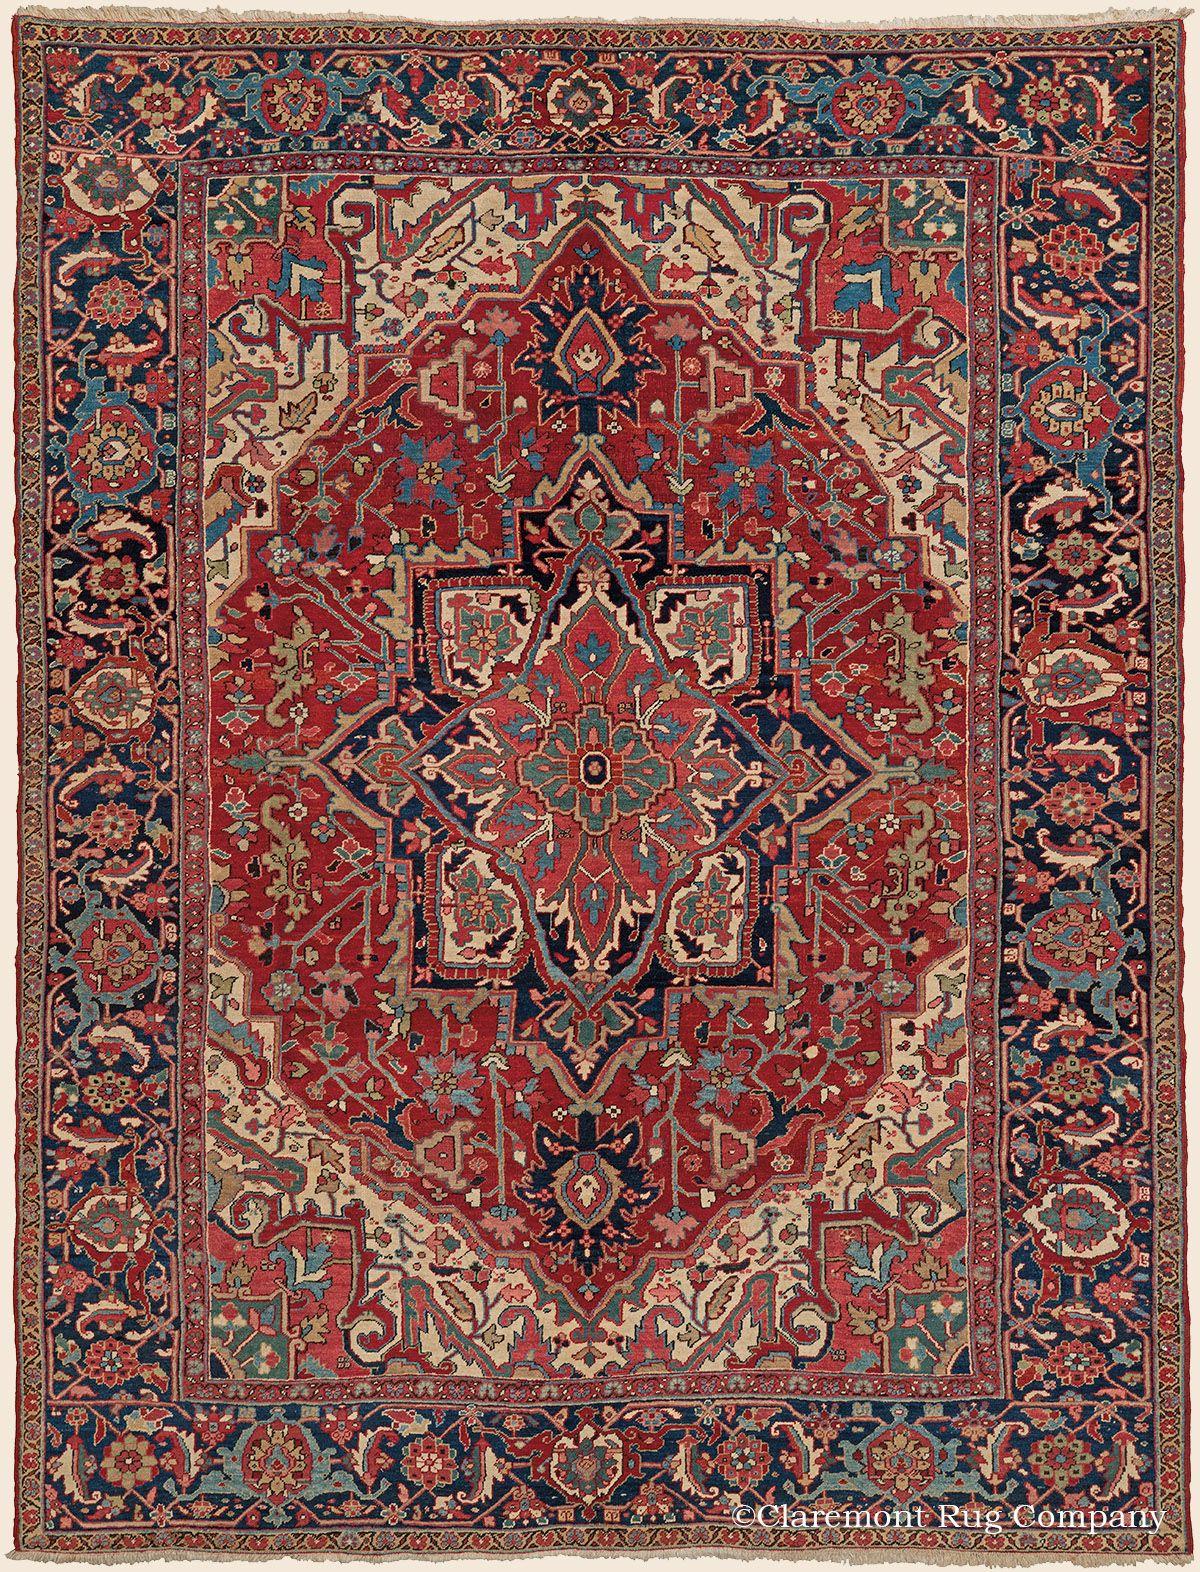 Heriz 8 9 X 11 5 Circa 1920 Price 14 000 Northwest Persian Antique Rug Claremont Company